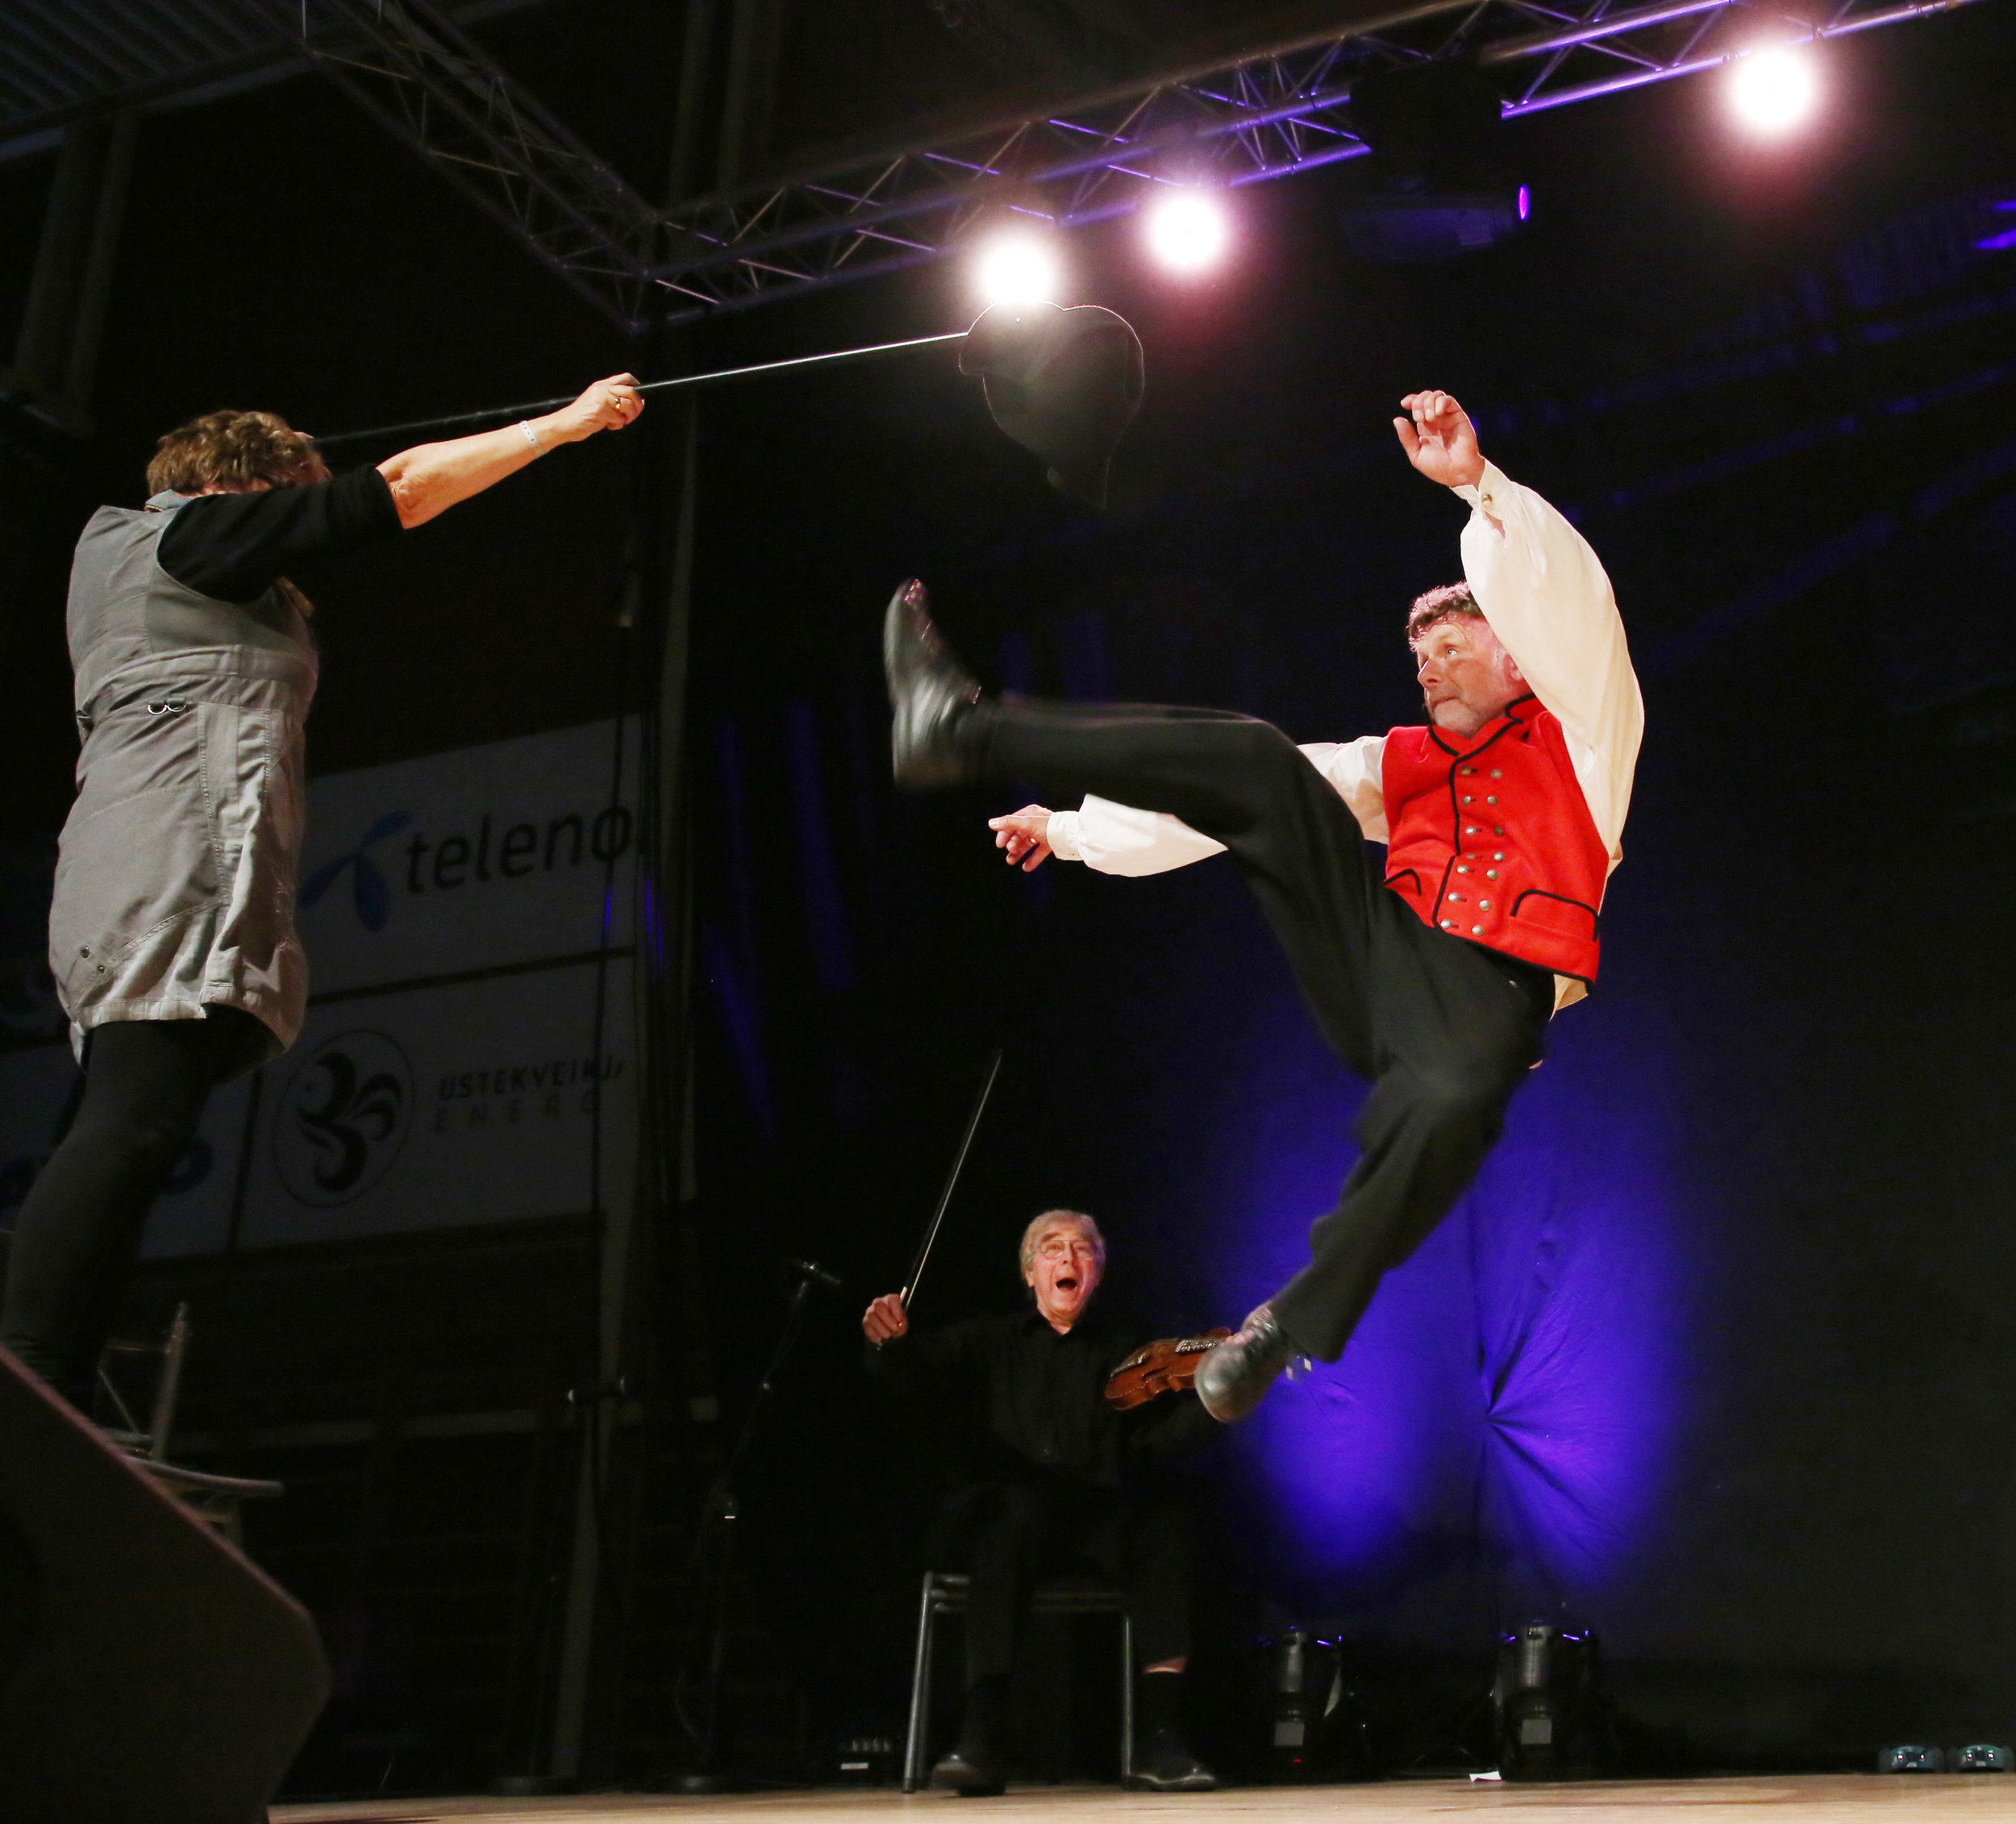 The halling dancer Vidar Underseth and fiddler Sigmund Eikås in action.